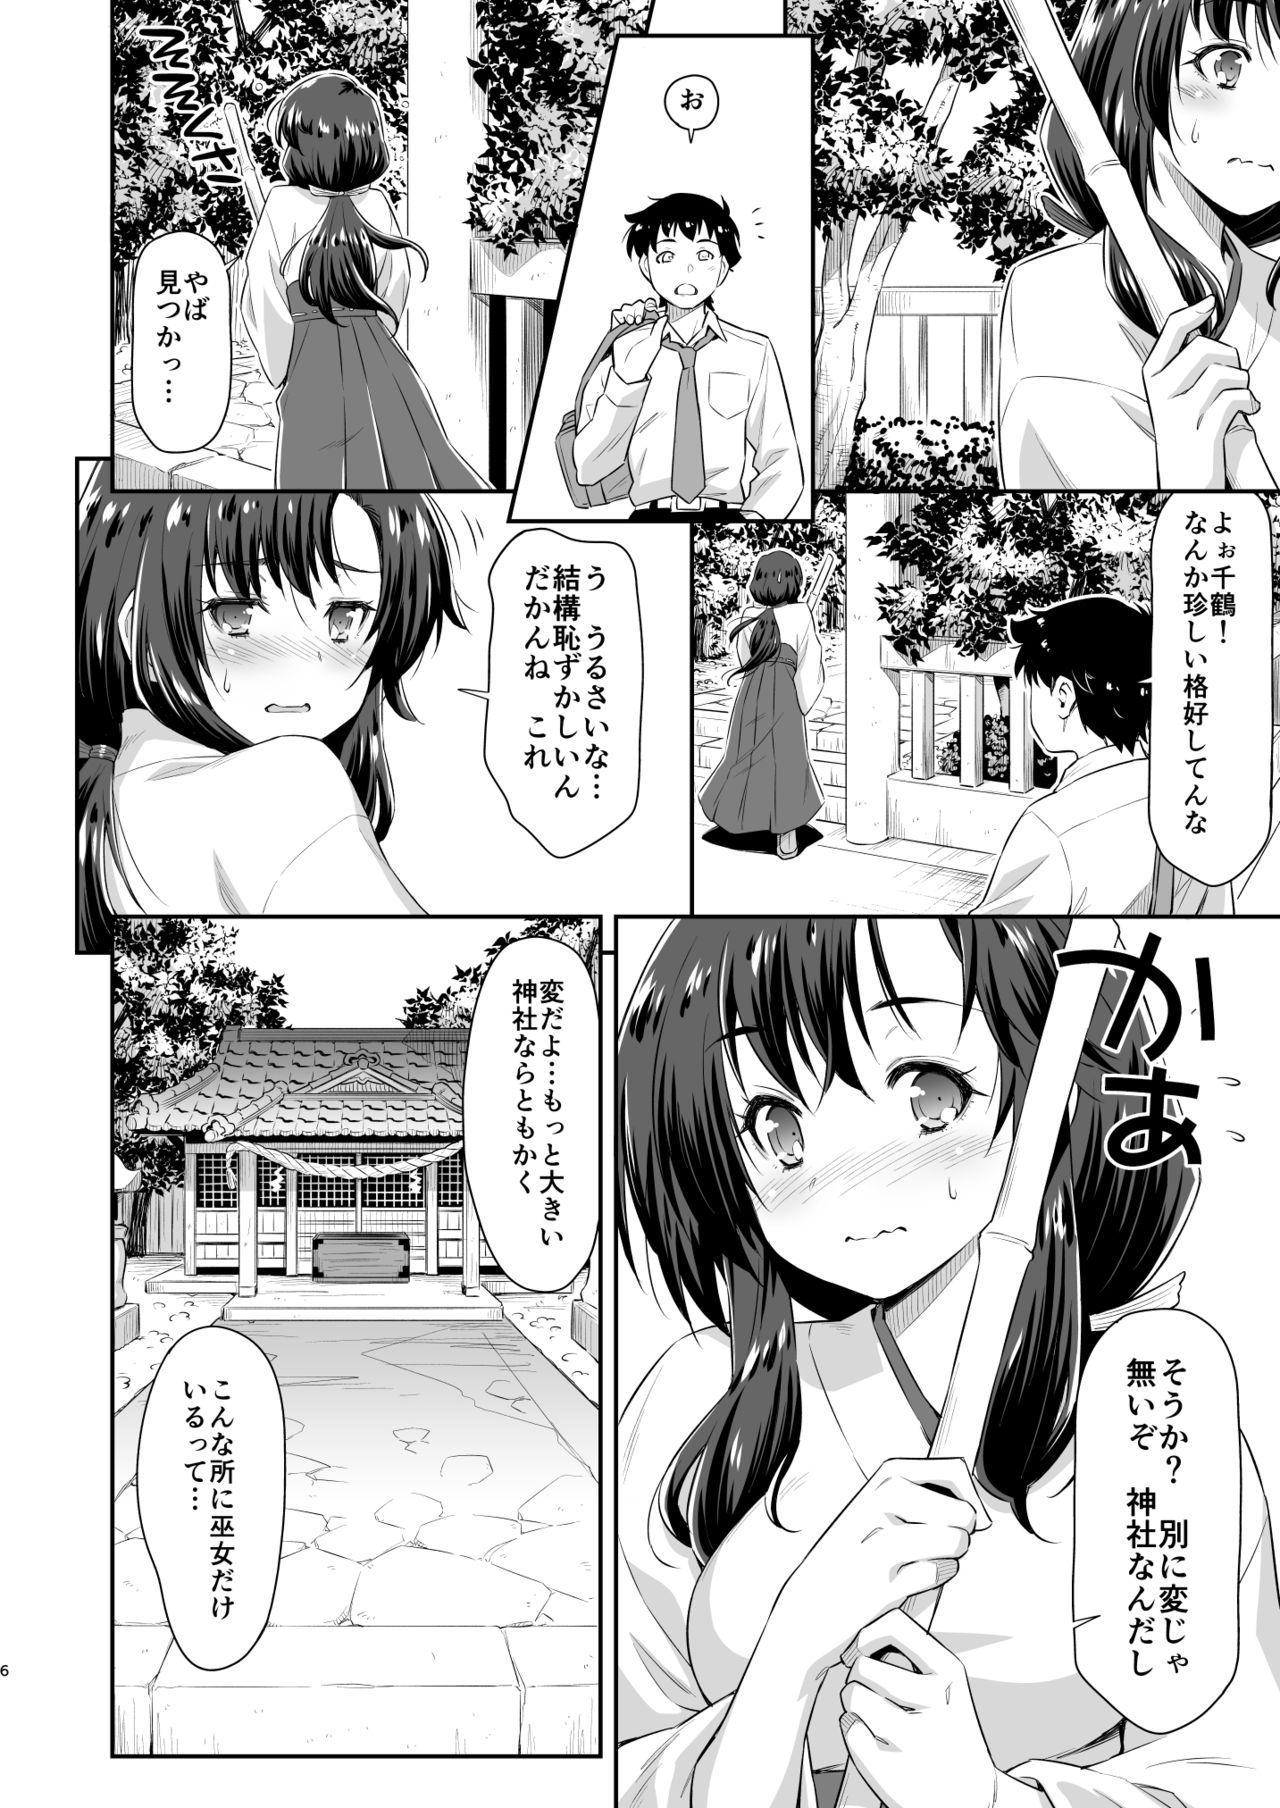 Osanajimi to Kitsune-sama 4